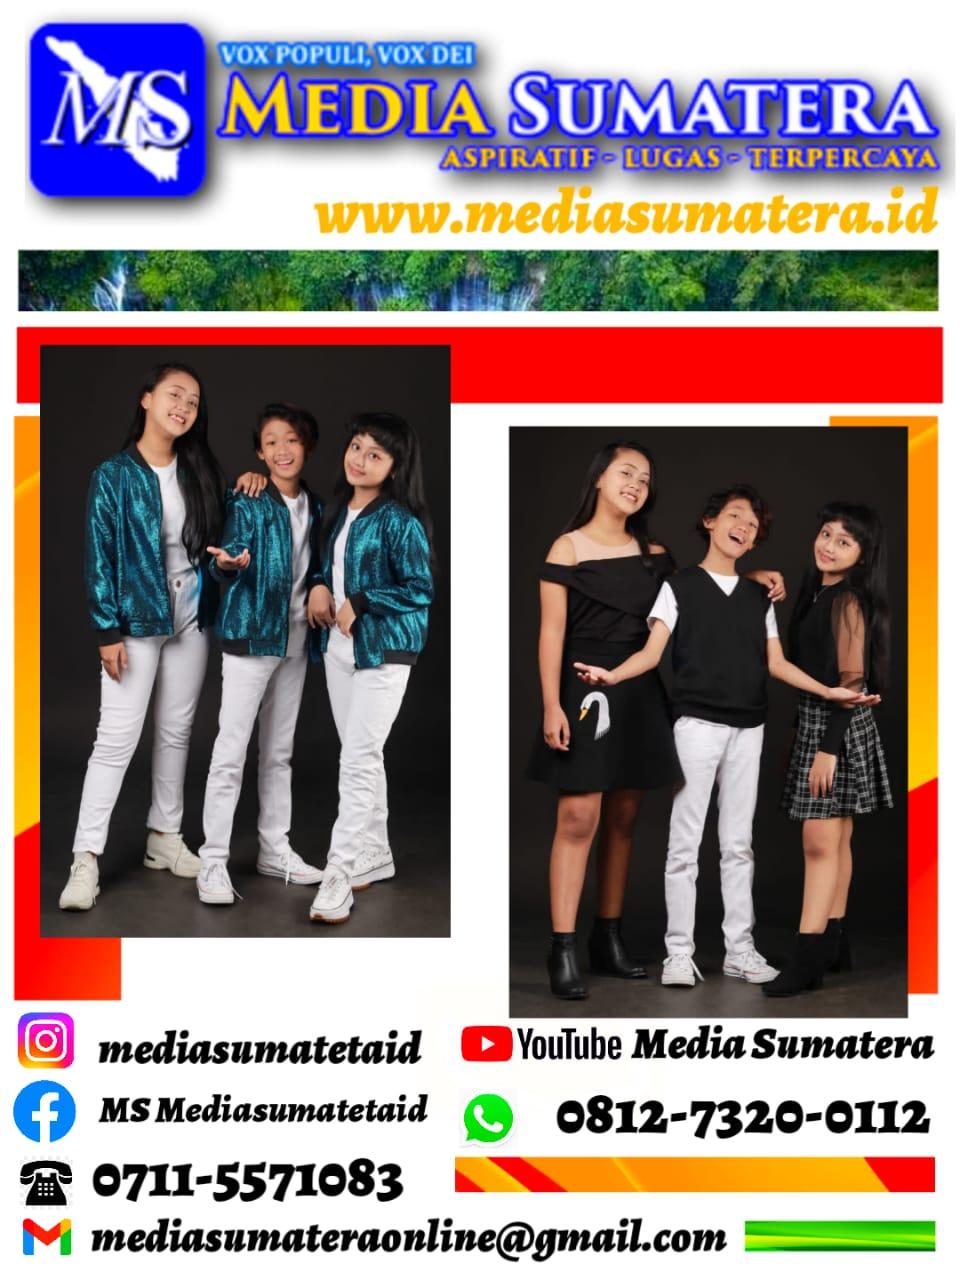 Trio GAJ Pendatang Dari Yogyakarta Ramaikan Blantika Musik Indonesia